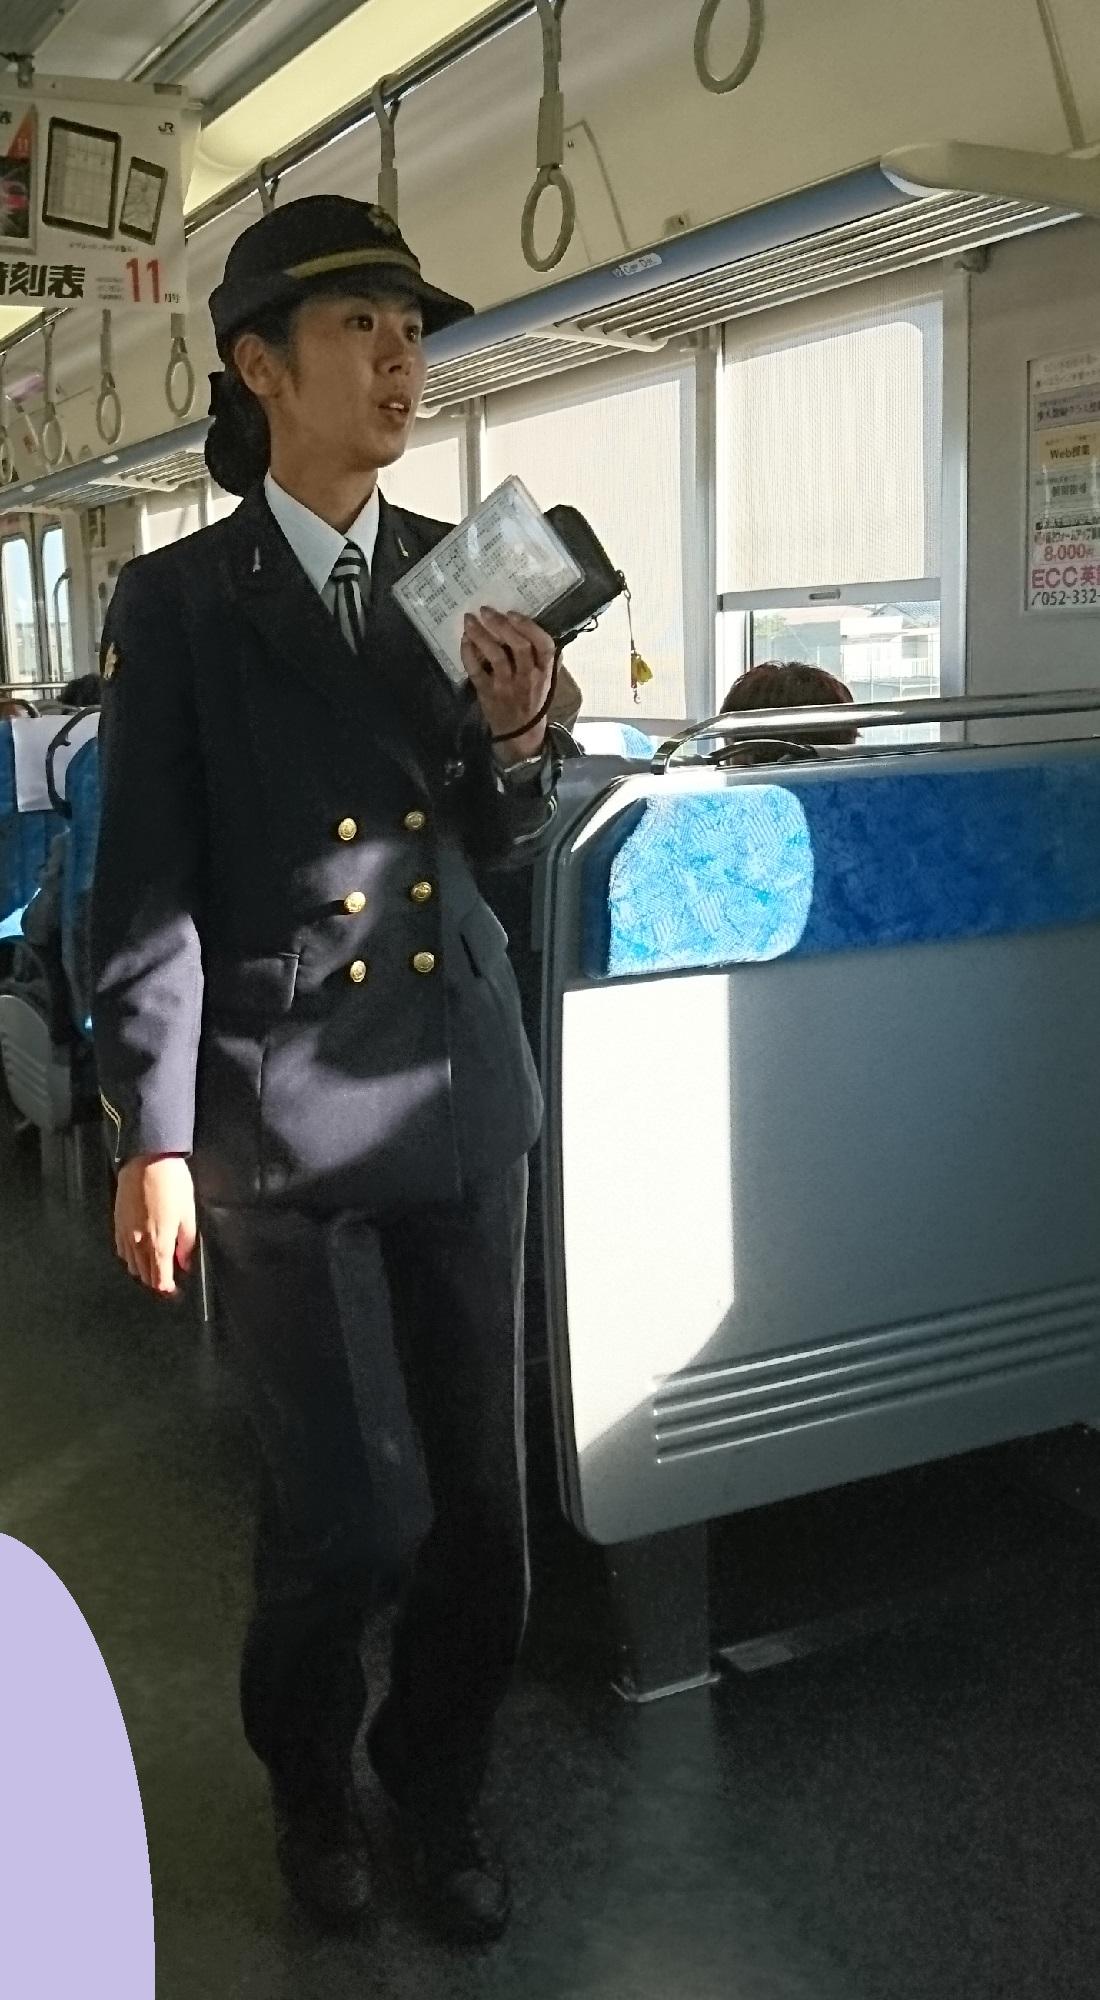 2016.11.16 東海道線 (6) 大垣いき特別快速 - 車内 1100-2000